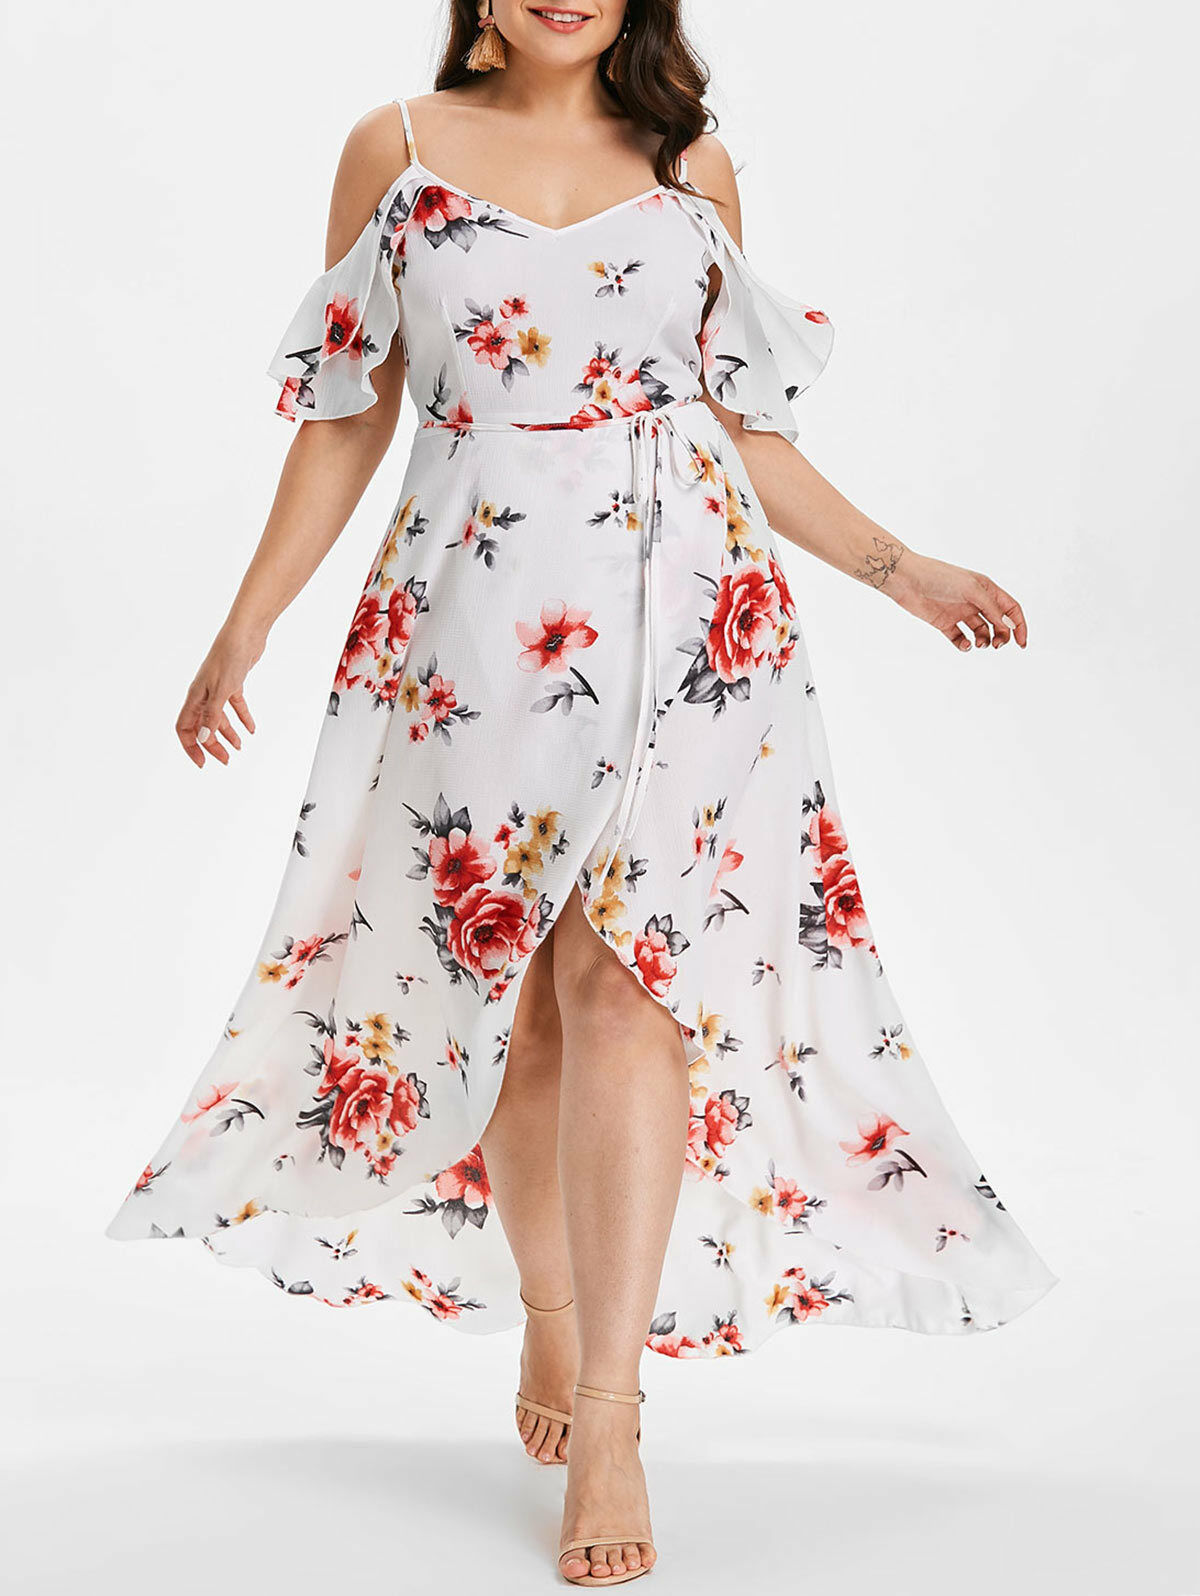 99a257ec9302 Plus Size Casual Dress Cold Dew Shoulder Floral Overlap Maxi Flowing Cut  Out. . SHIPPING: